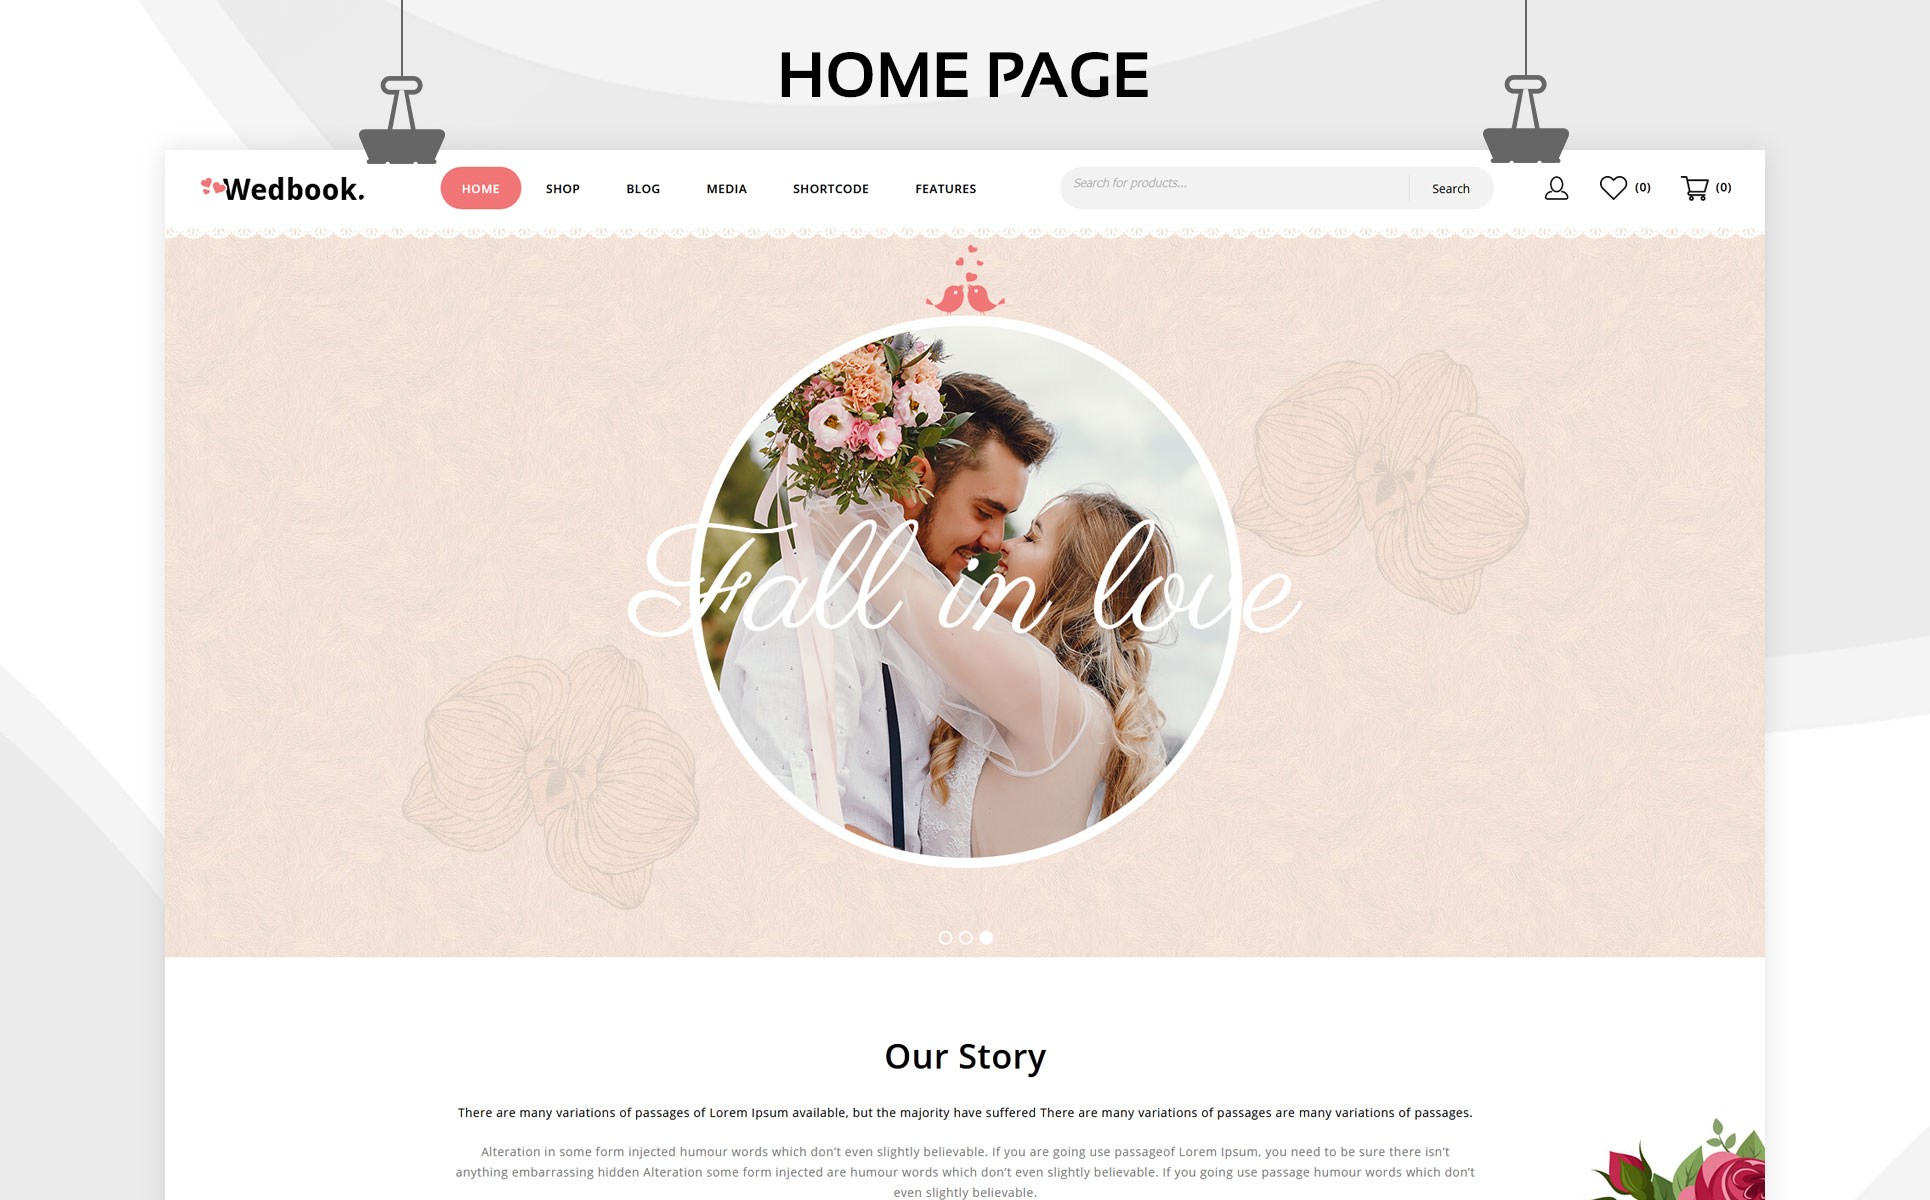 Wedbook - The Wedding Store Responsive WooCommerce Theme